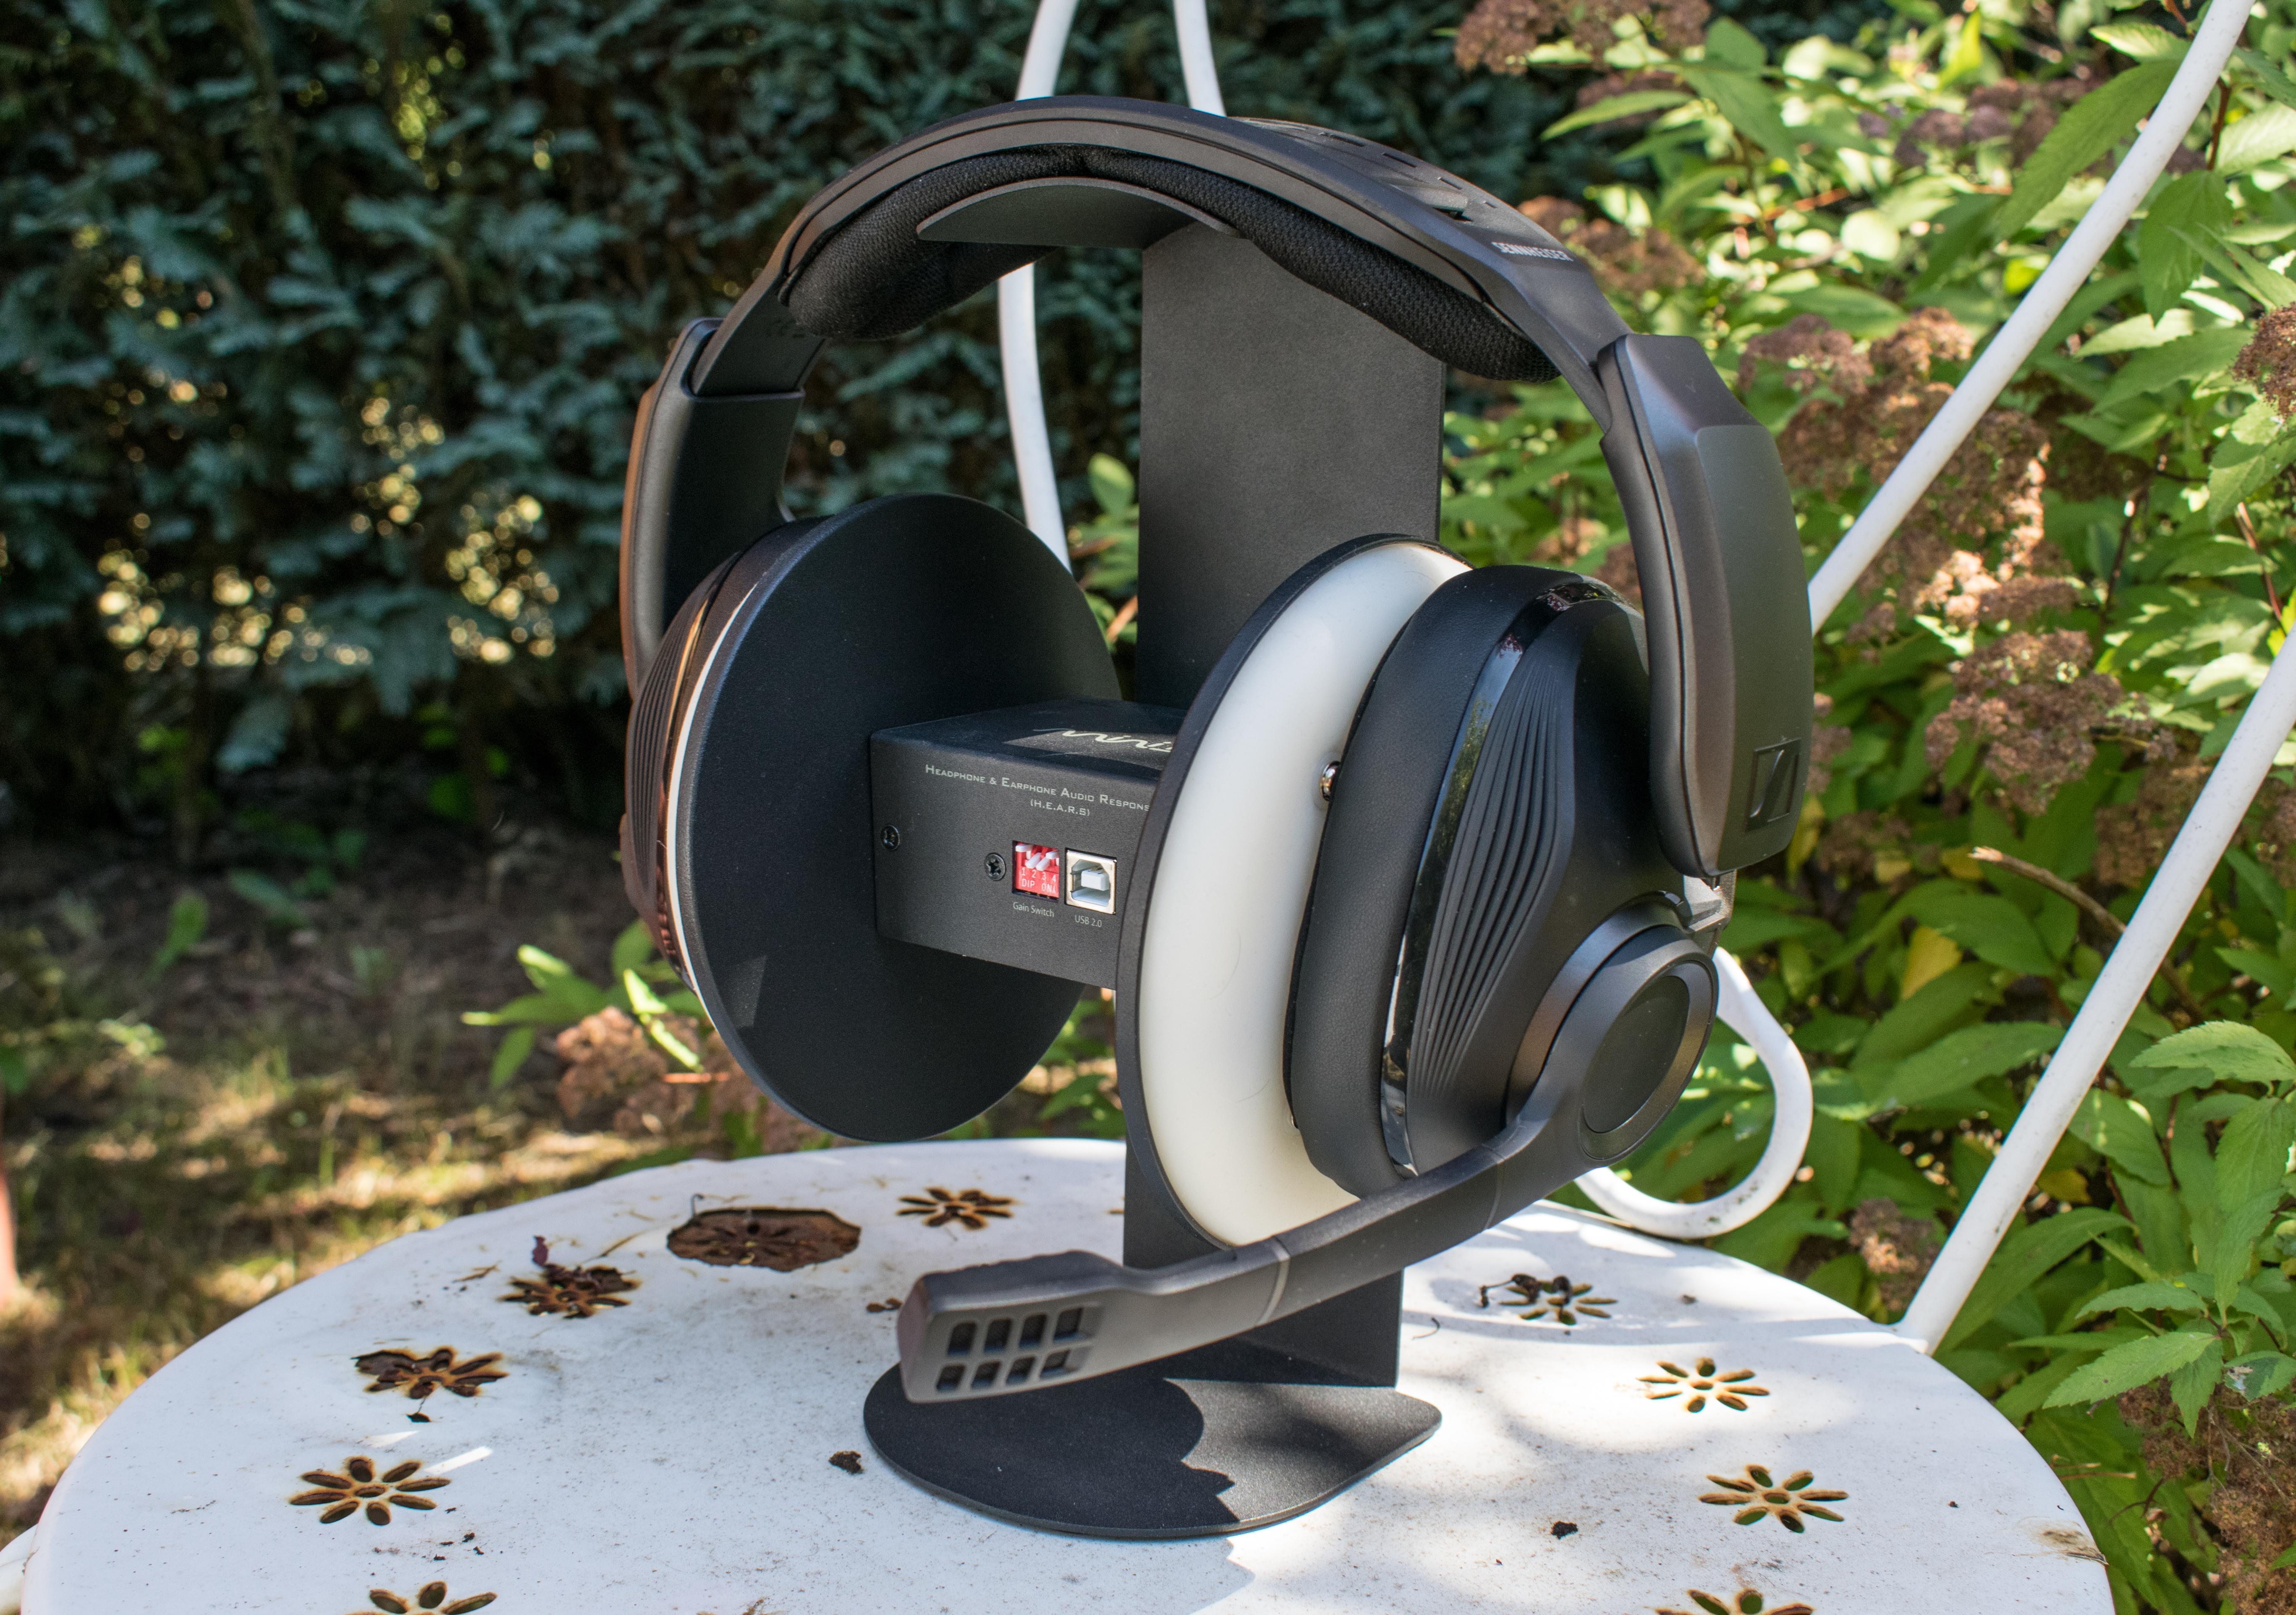 Audio Quality Measurement - The Sennheiser GSP670 Wireless